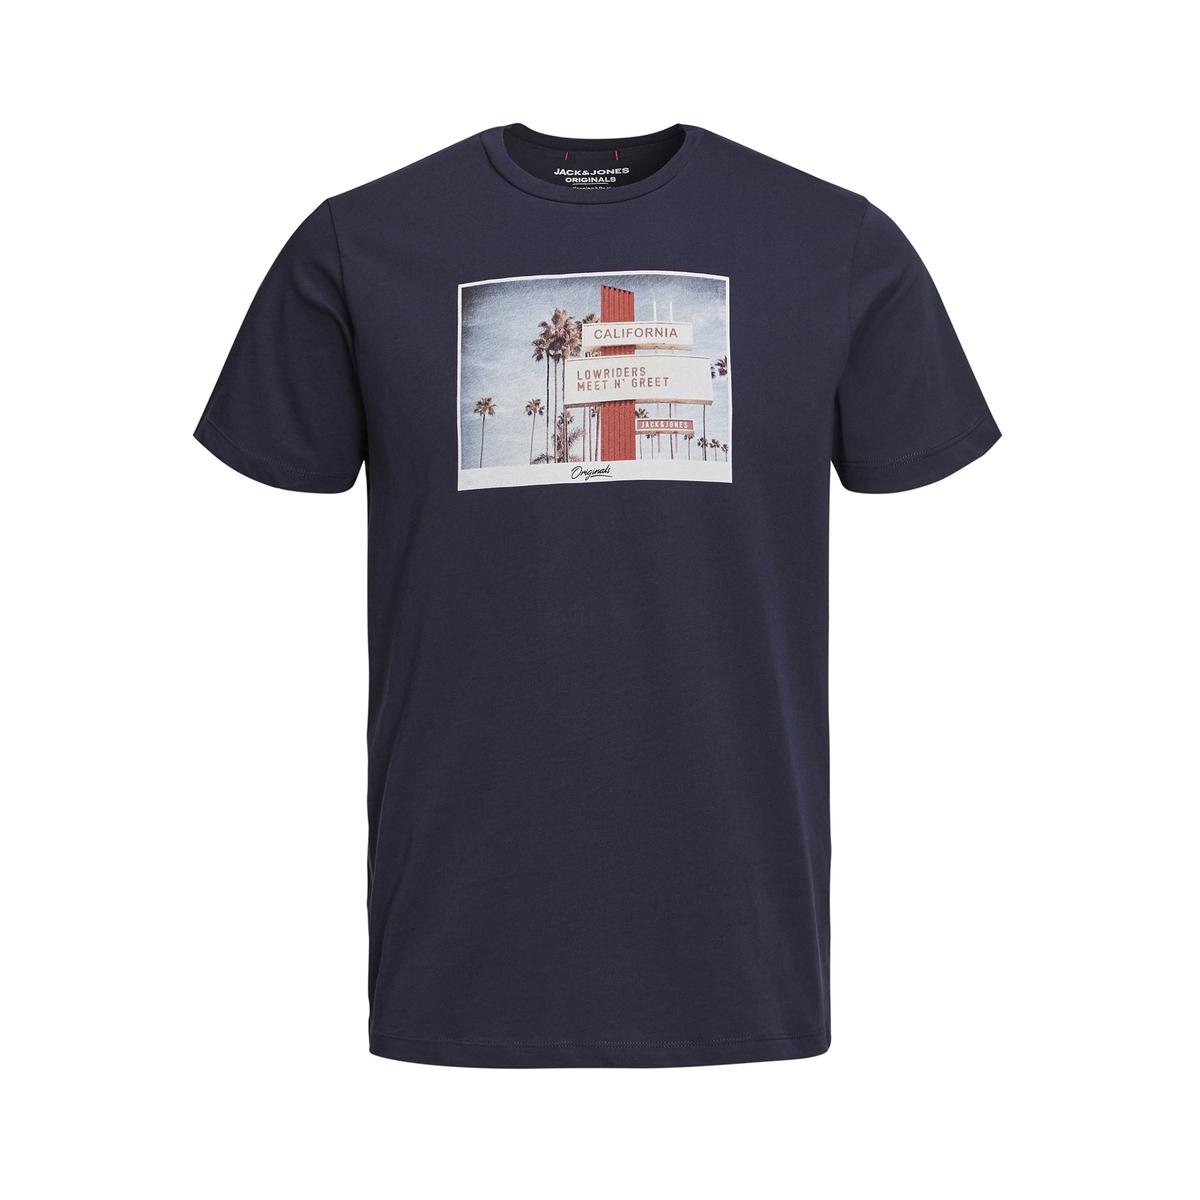 Футболка La Redoute С рисунком спереди 12 лет -150 см синий футболка la redoute с рисунком 12 лет 150 см синий